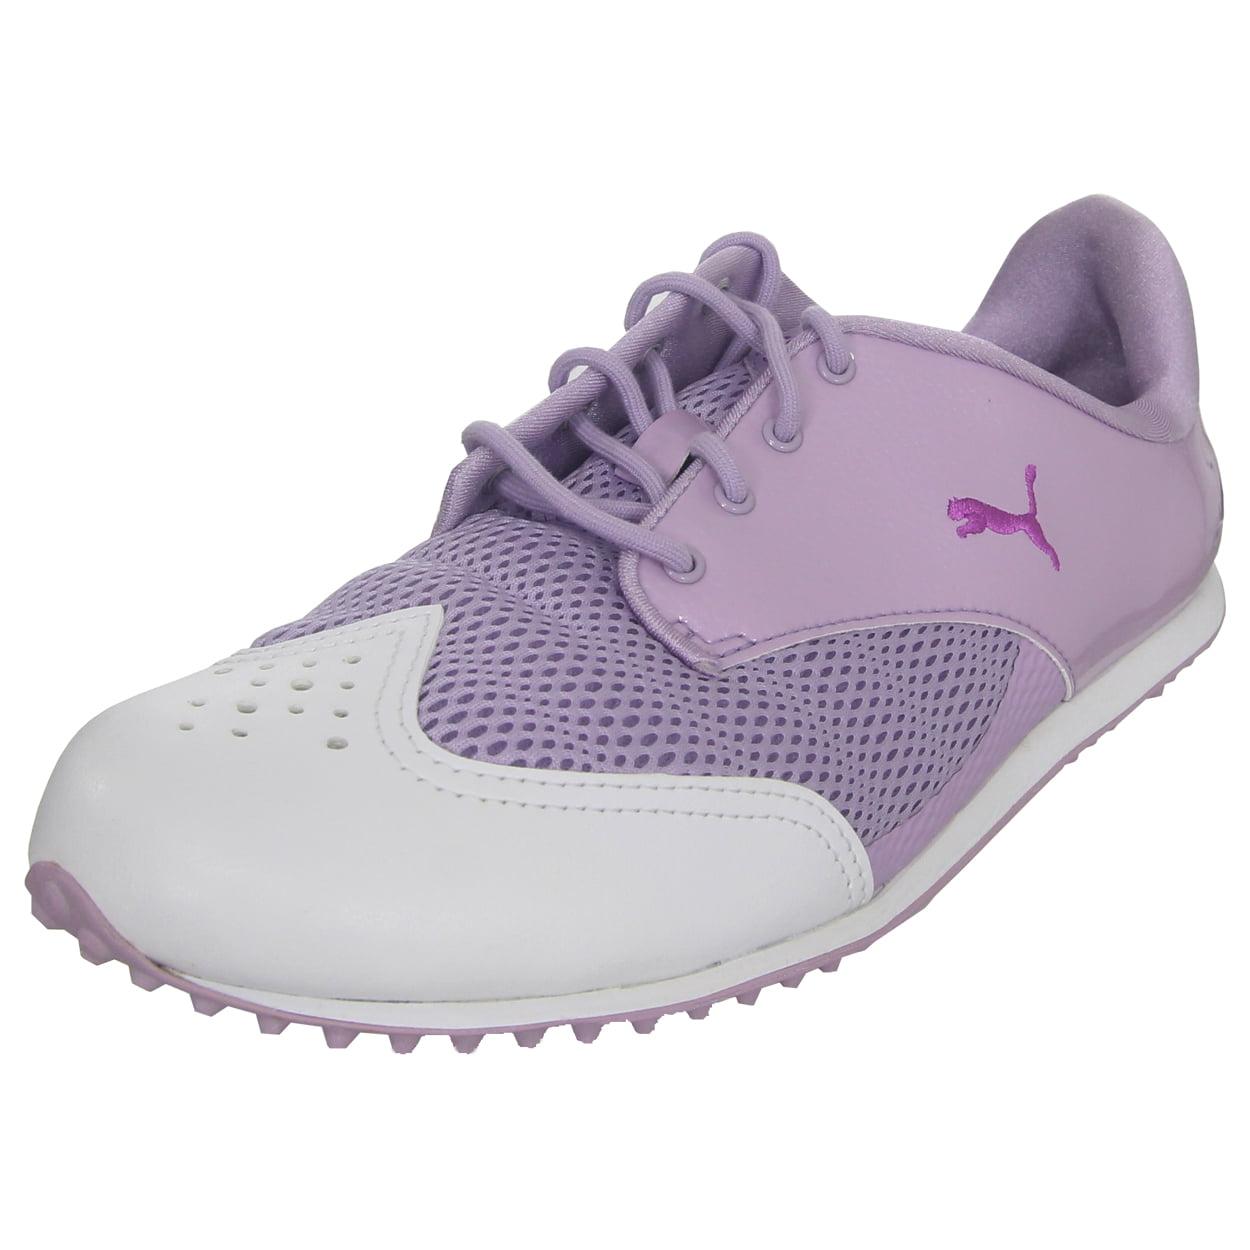 Puma Women's Summercat Golf Shoe, 5.5 Medium White/Lavend...